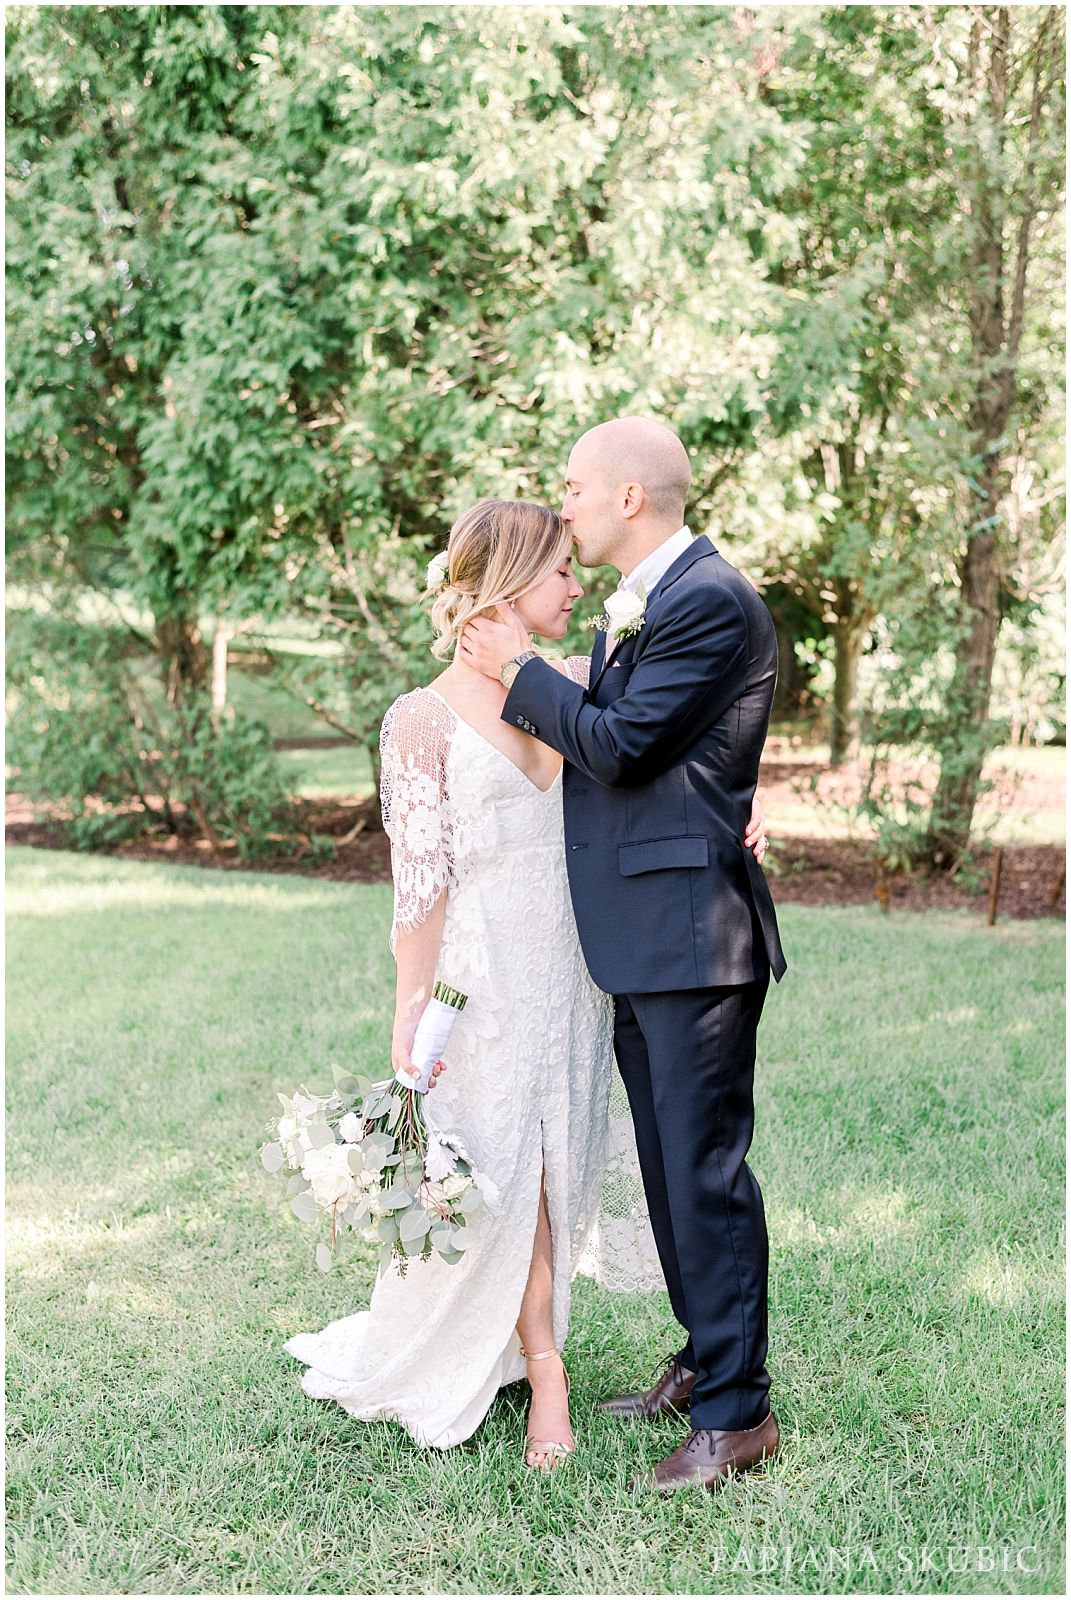 FabianaSkubic_H&M_Wedding_0022.jpg